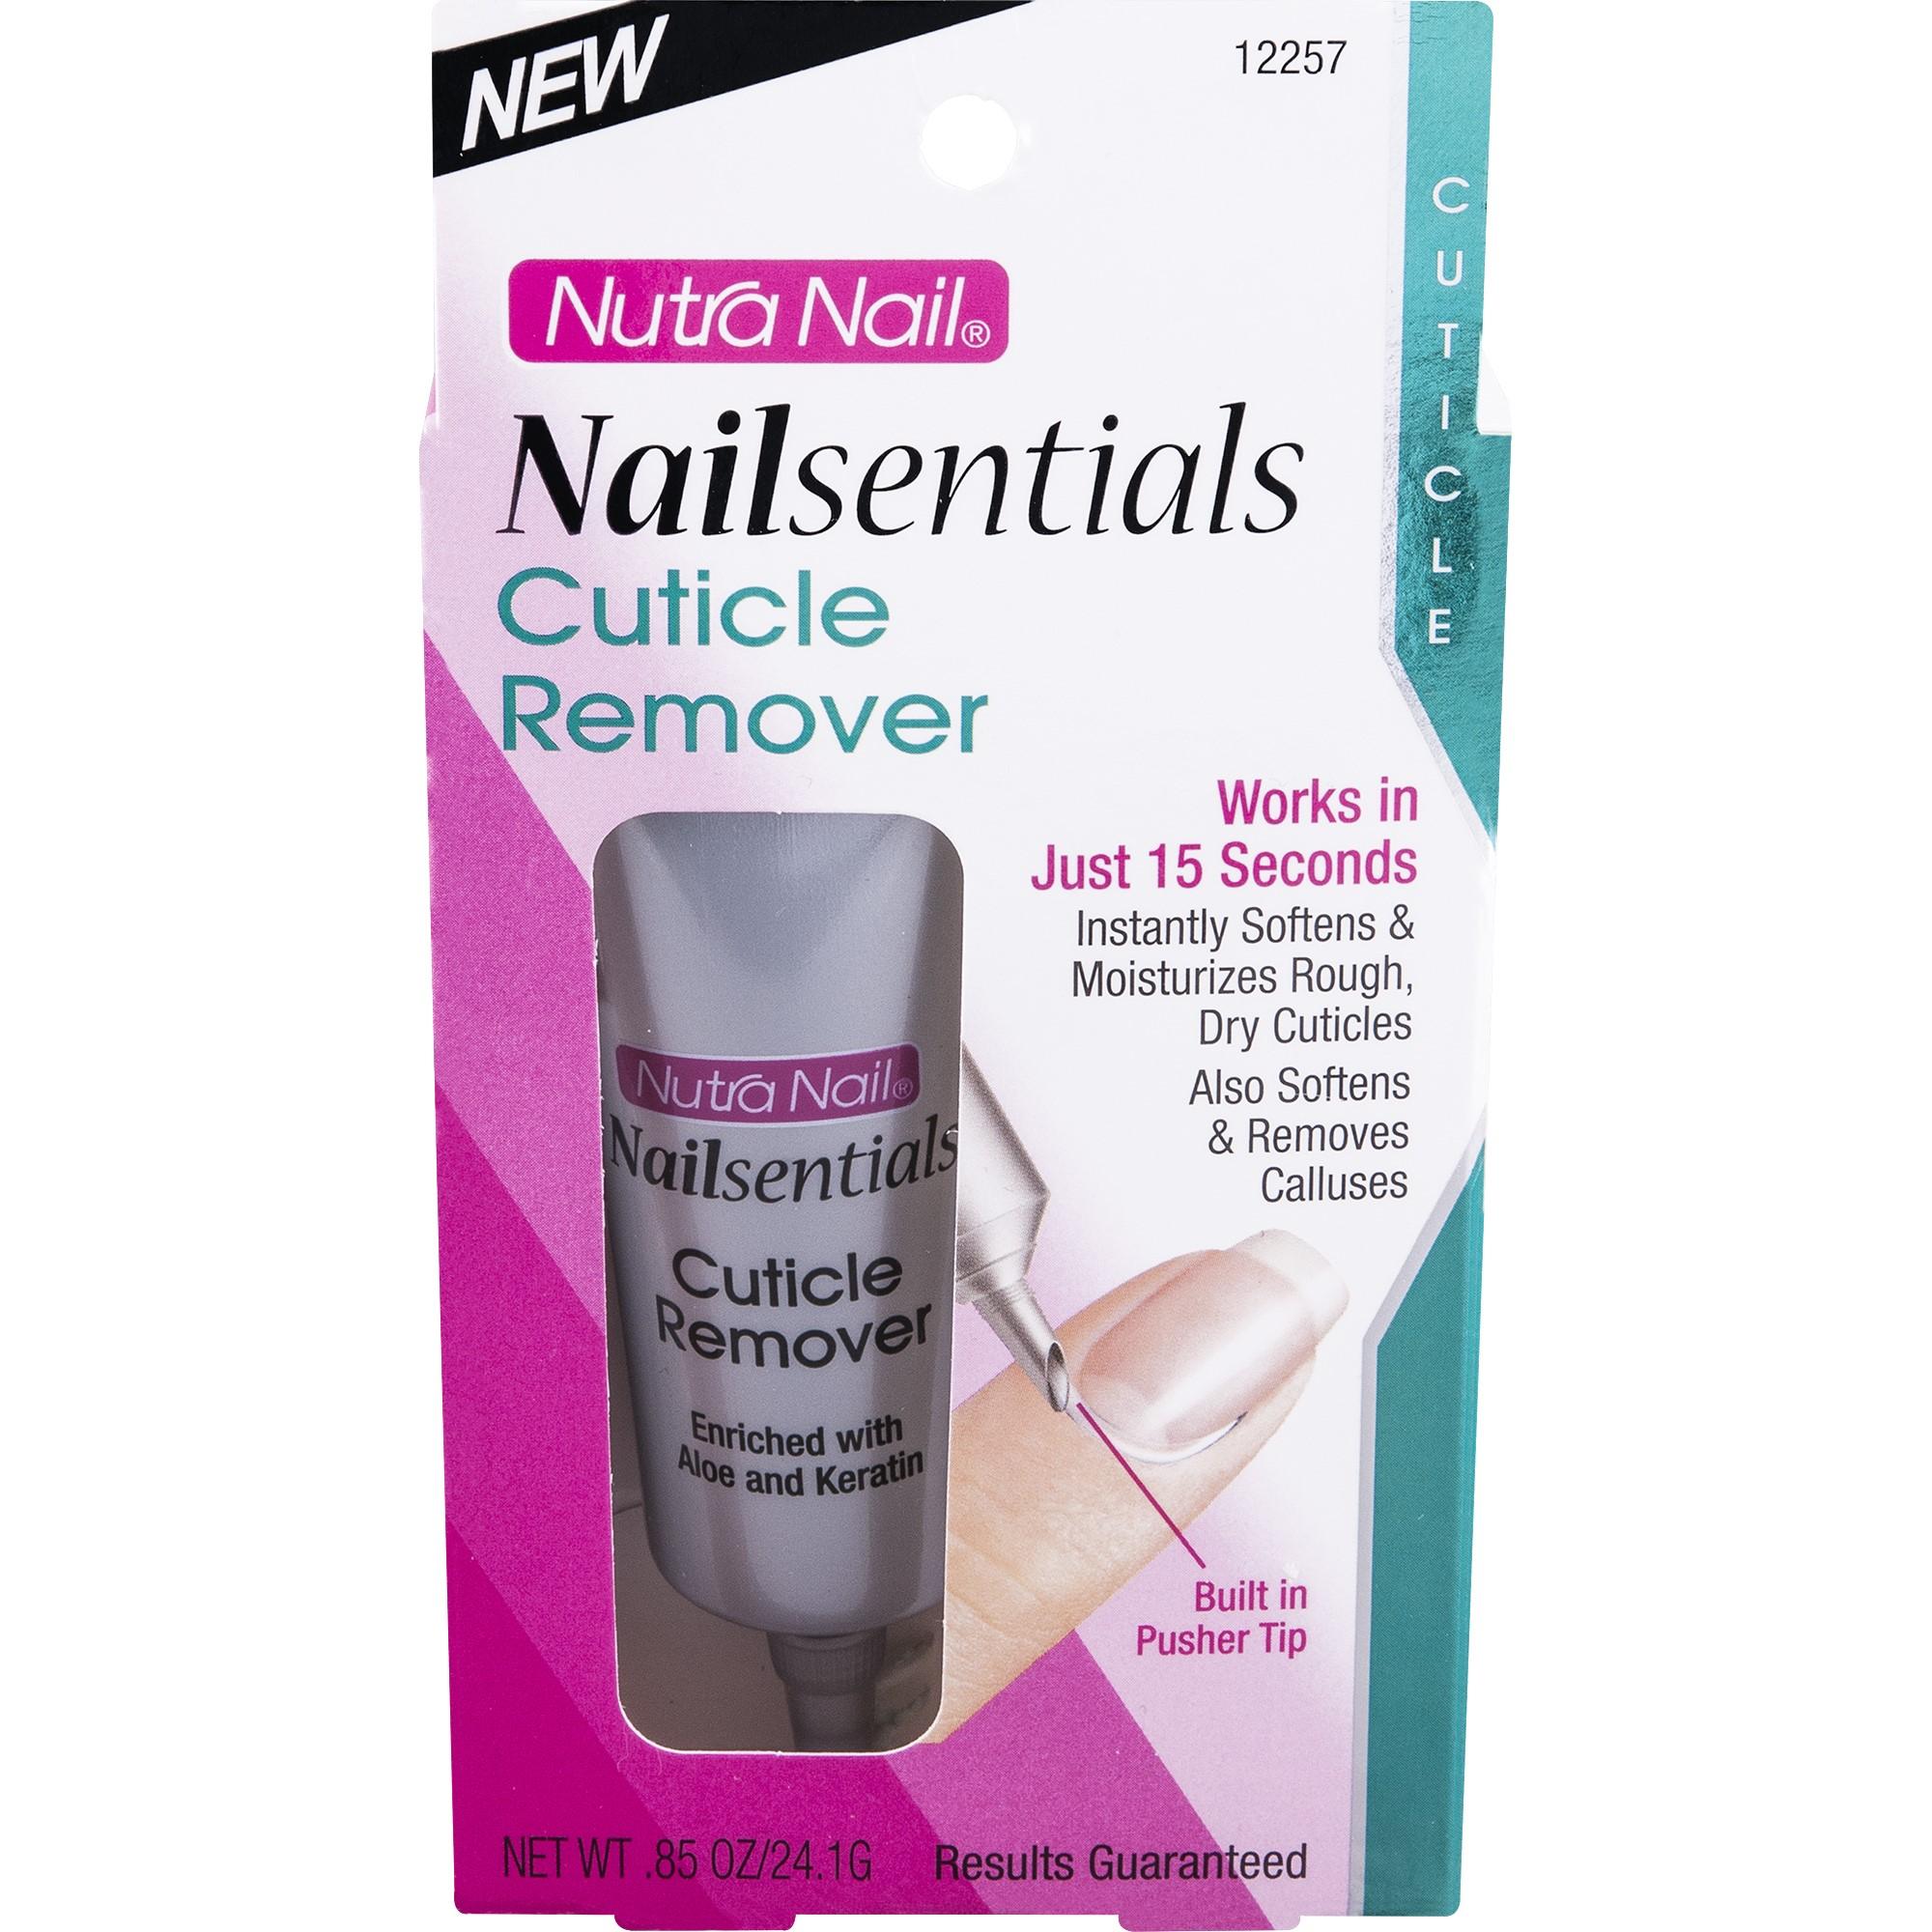 Nutra Nail Nailsentials Cuticle Remover, 0.45 Oz